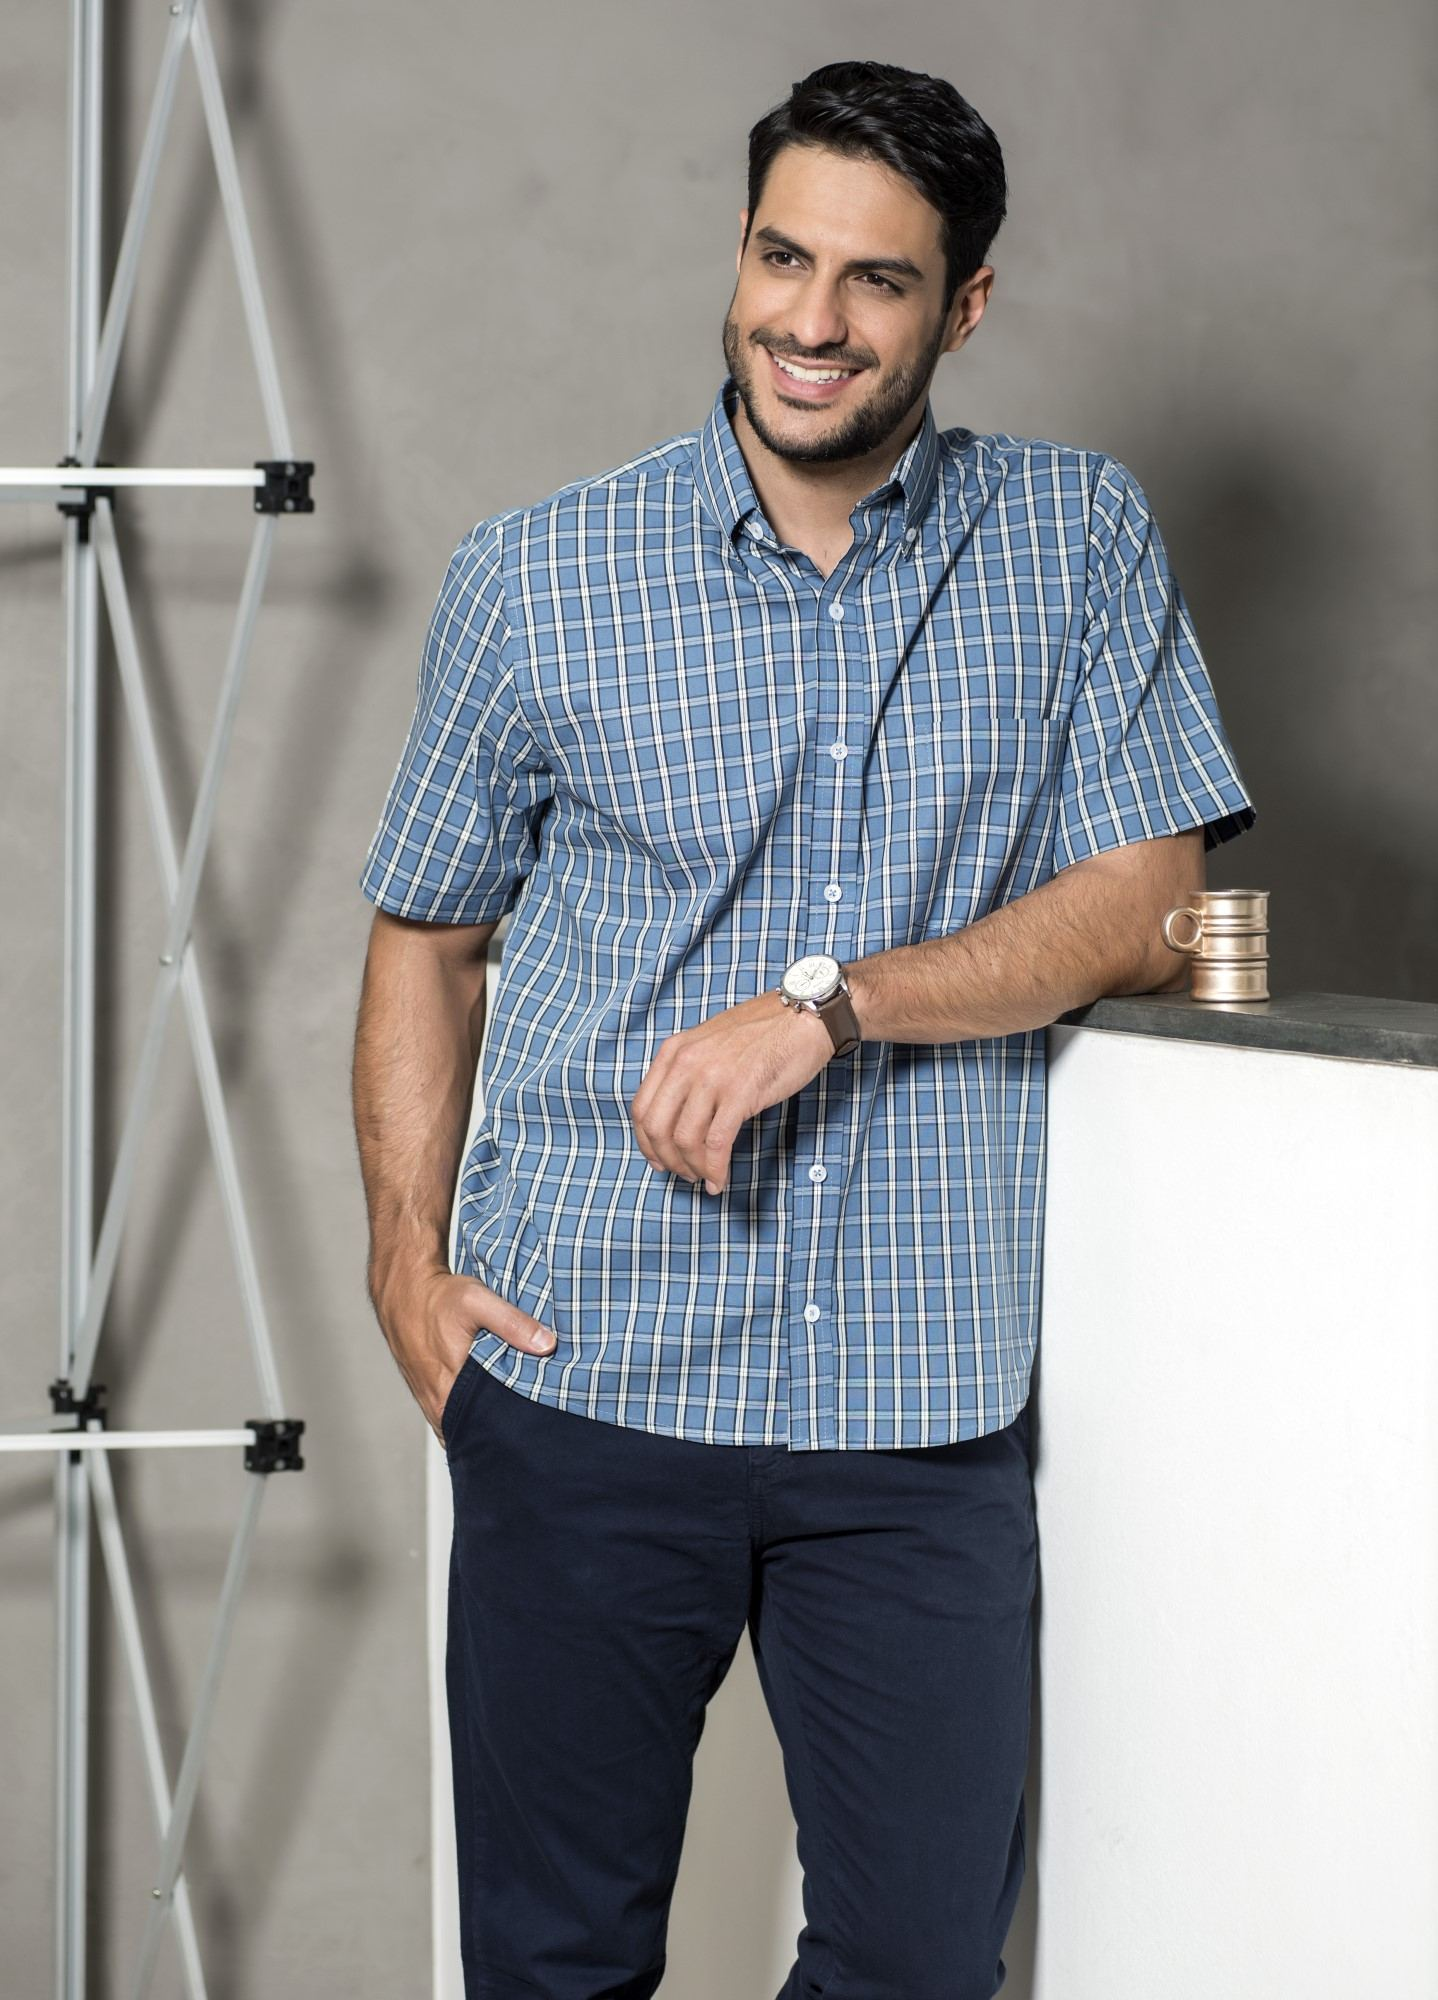 Camisa Xadrez Manga Curta Azul e Branca